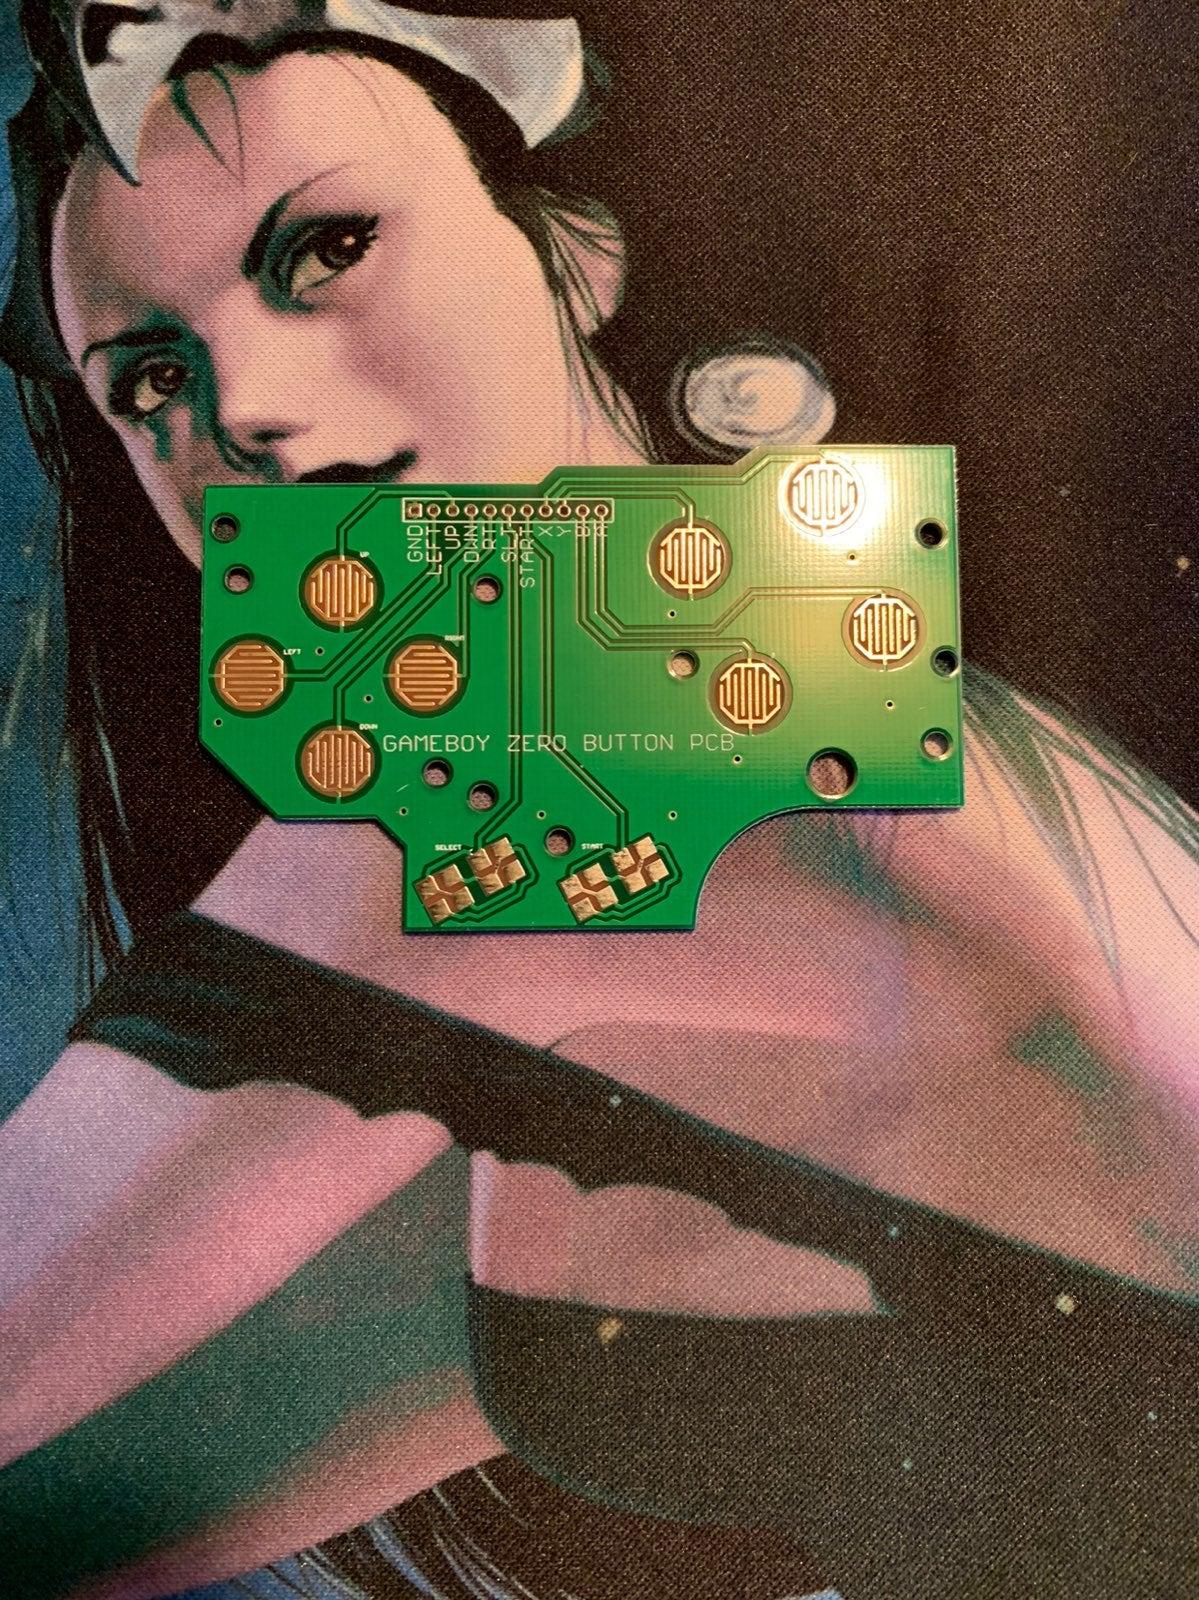 Gameboy Zero Button PCB